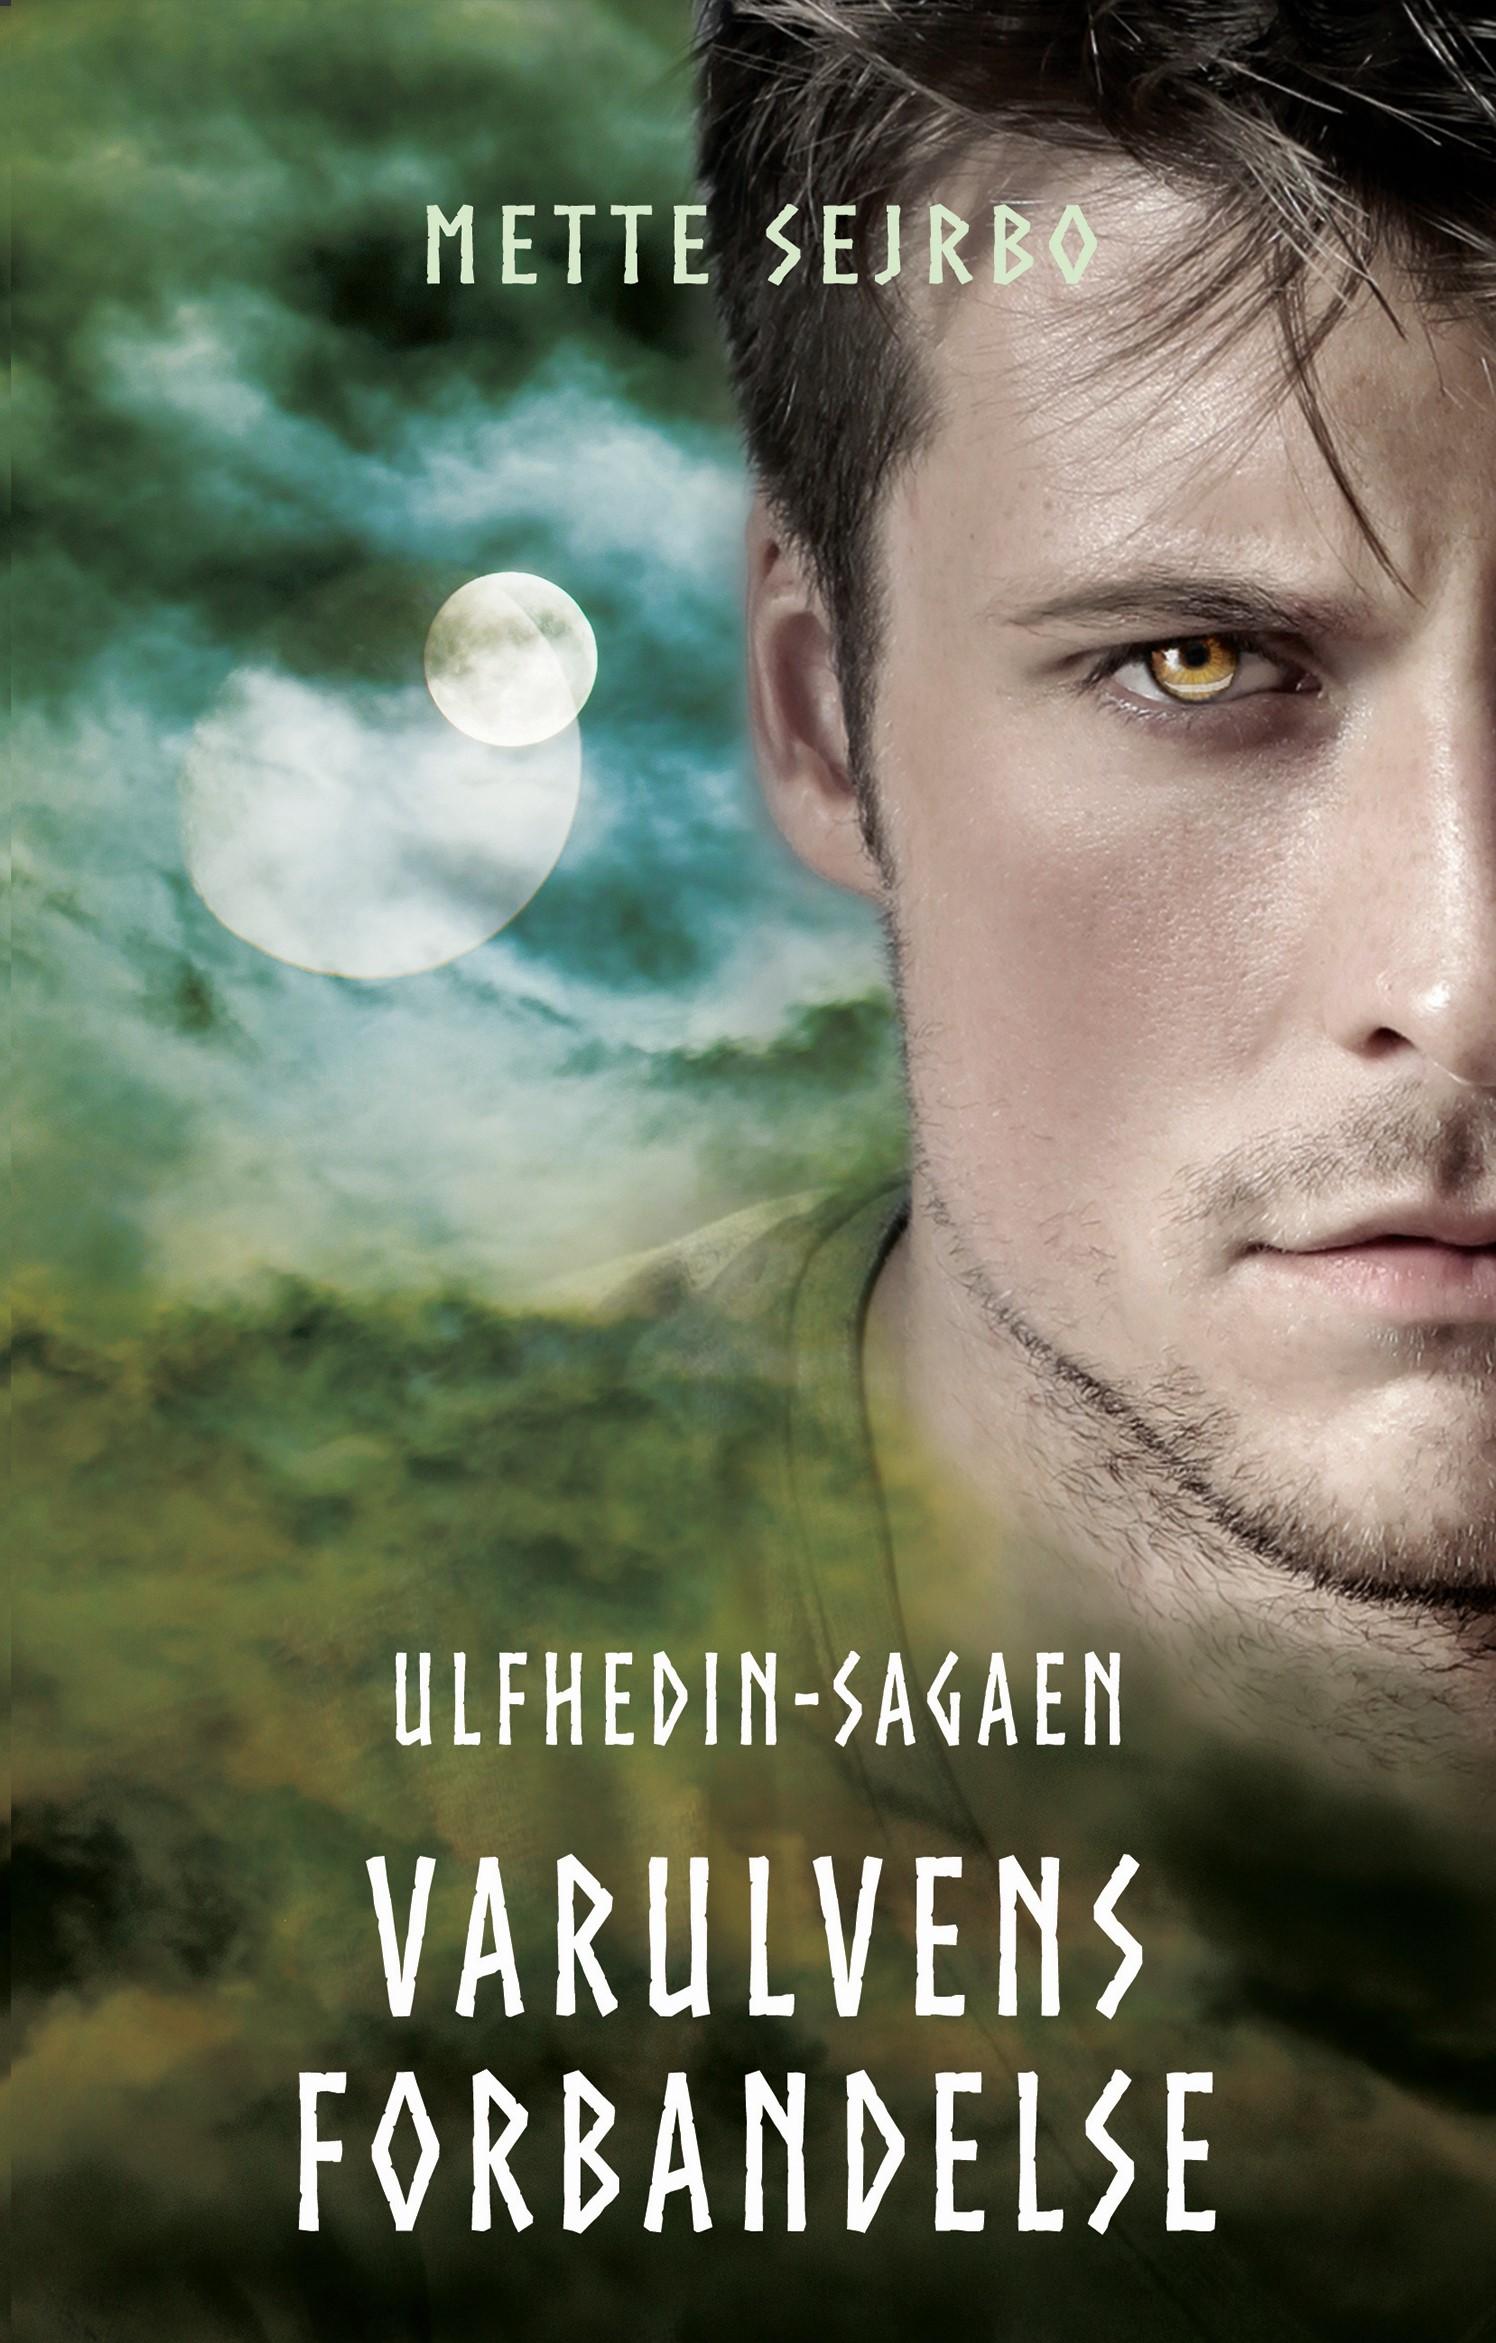 Varulvens forbandelse (Ulfhedin-sagaen #2)